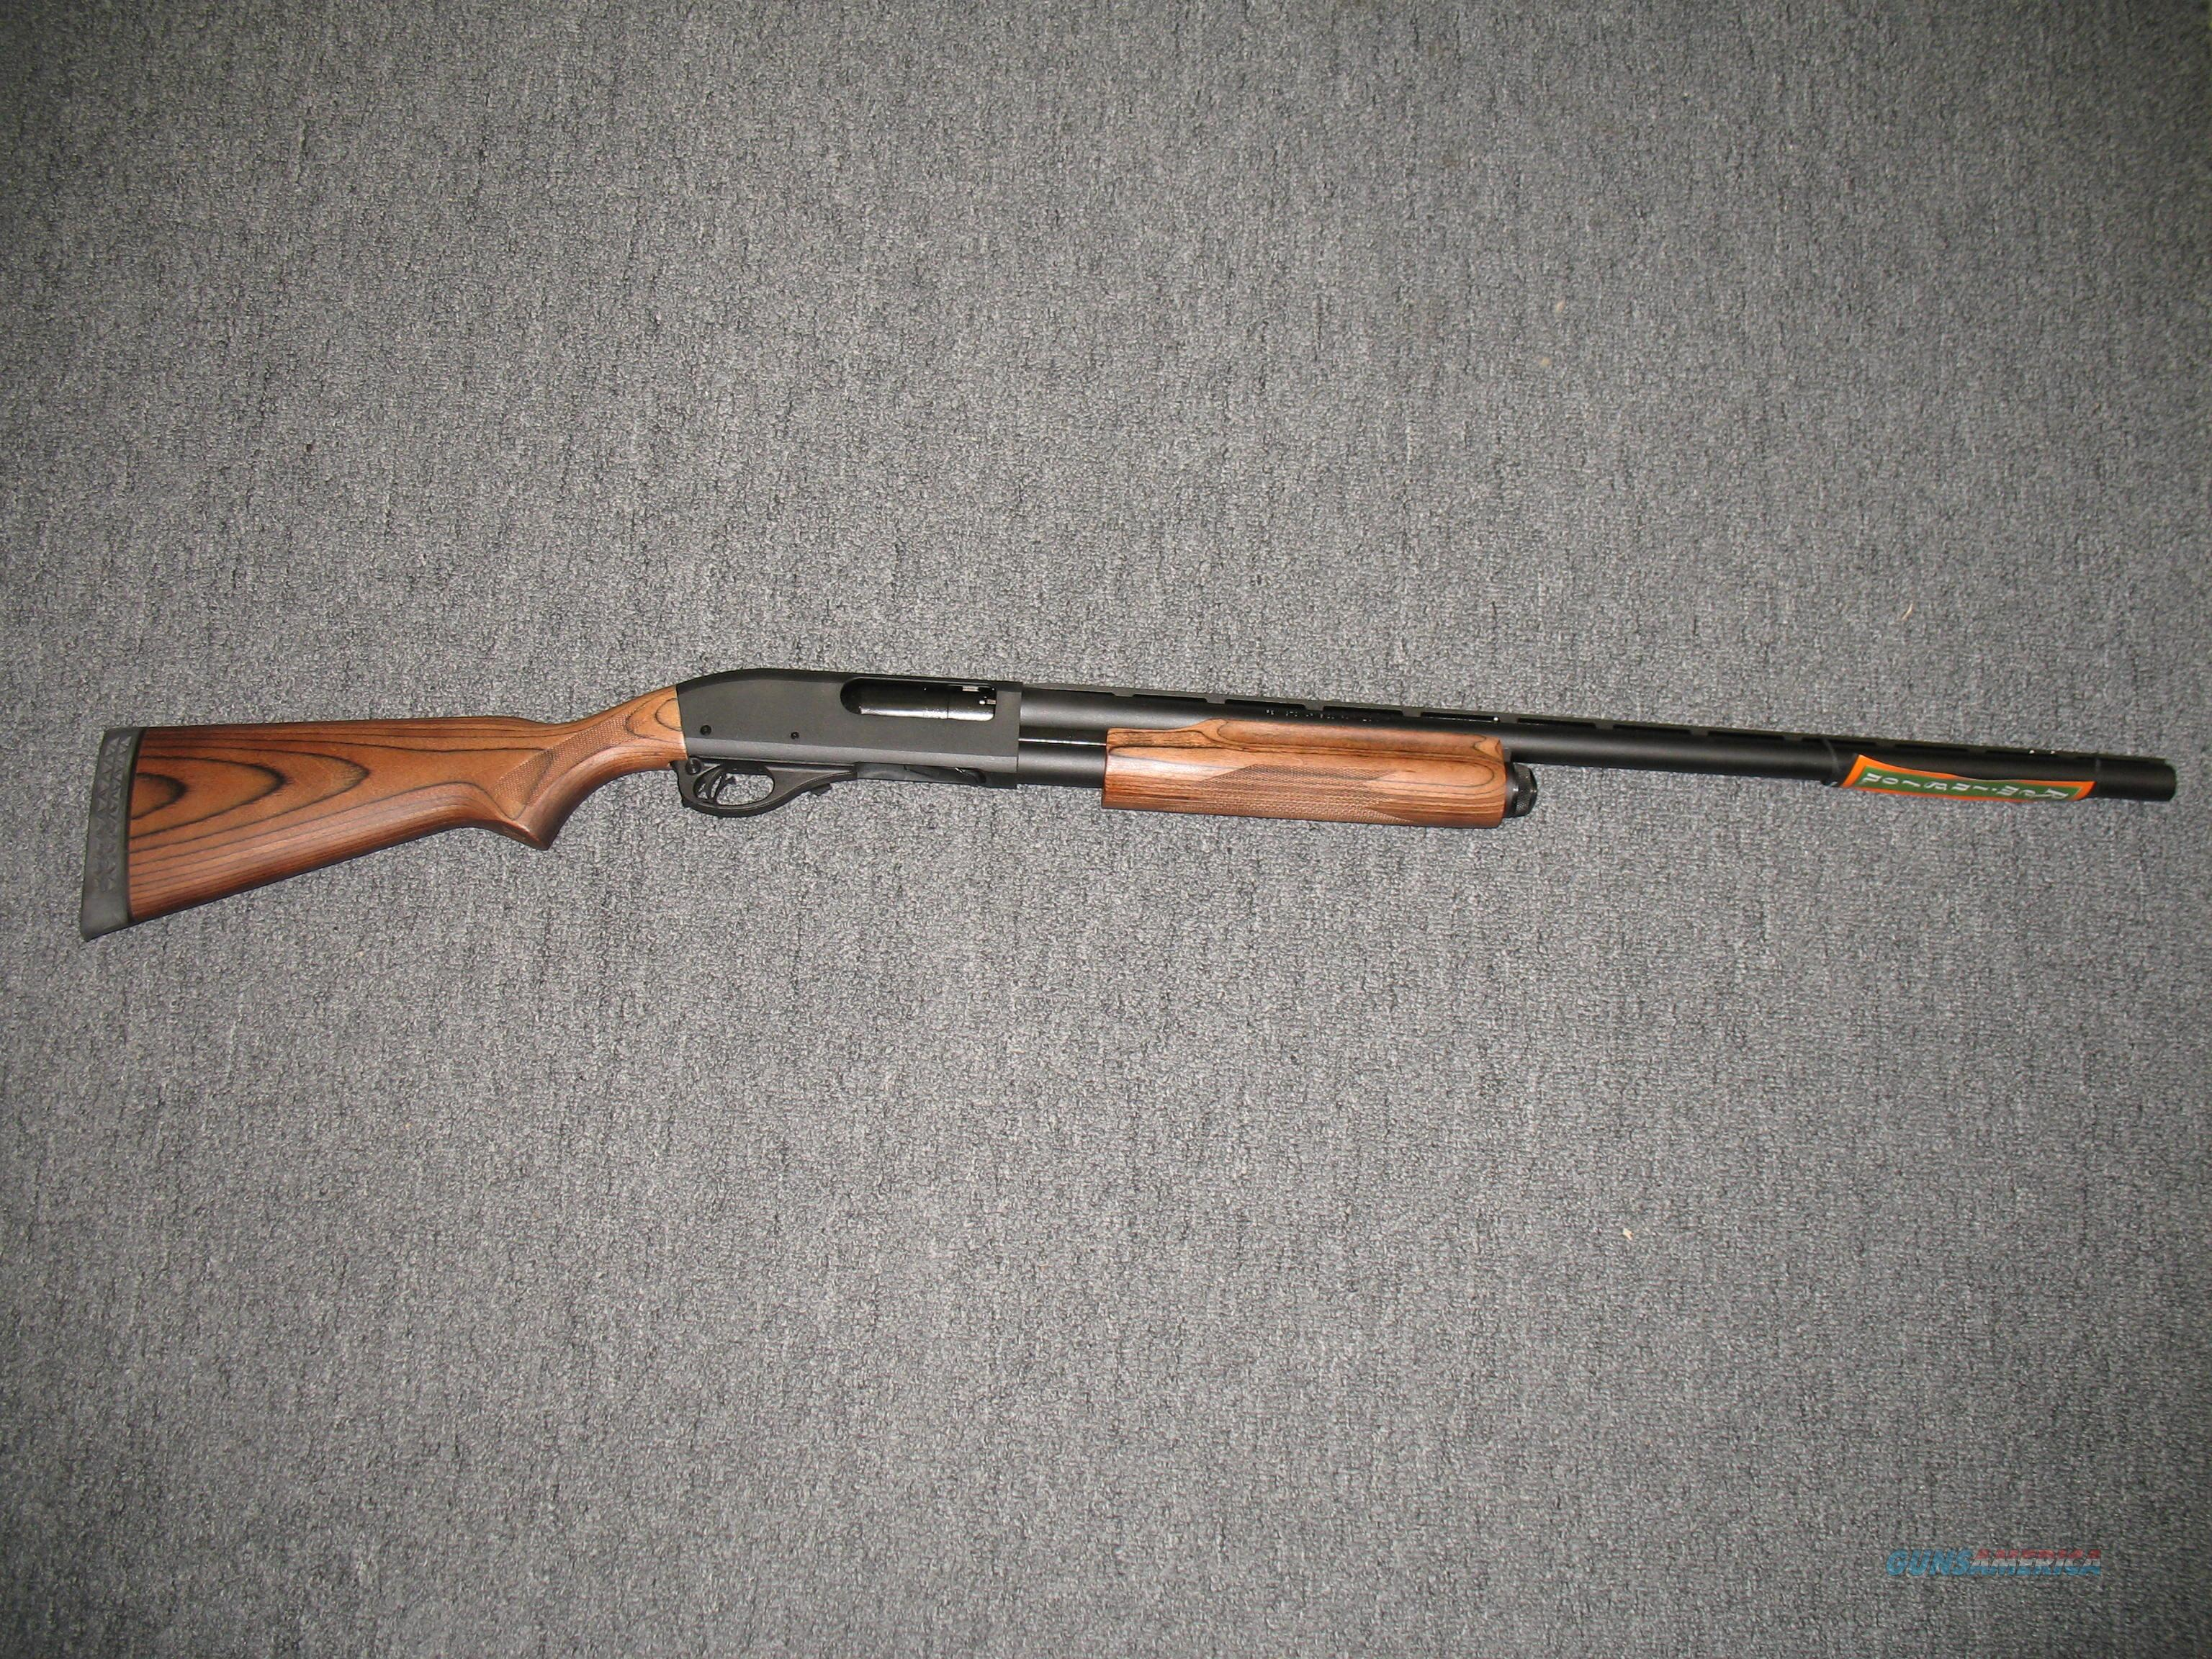 870 express super magnum wood stock for sale